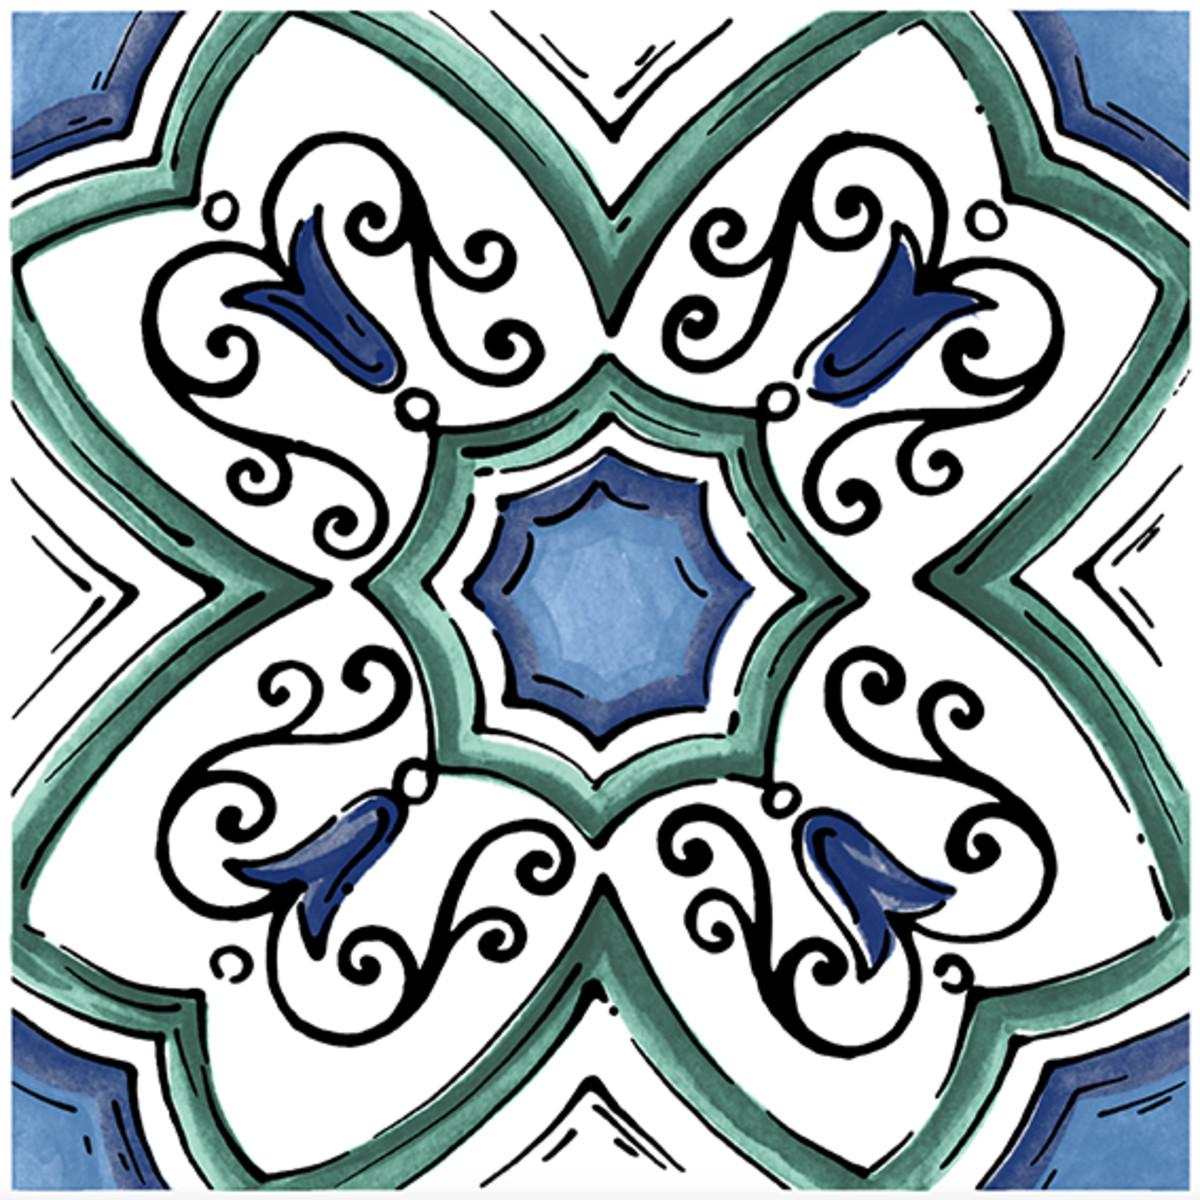 Декор Kerama Marazzi «Капри Майолика» 20х20 см цвет синий/зеленый